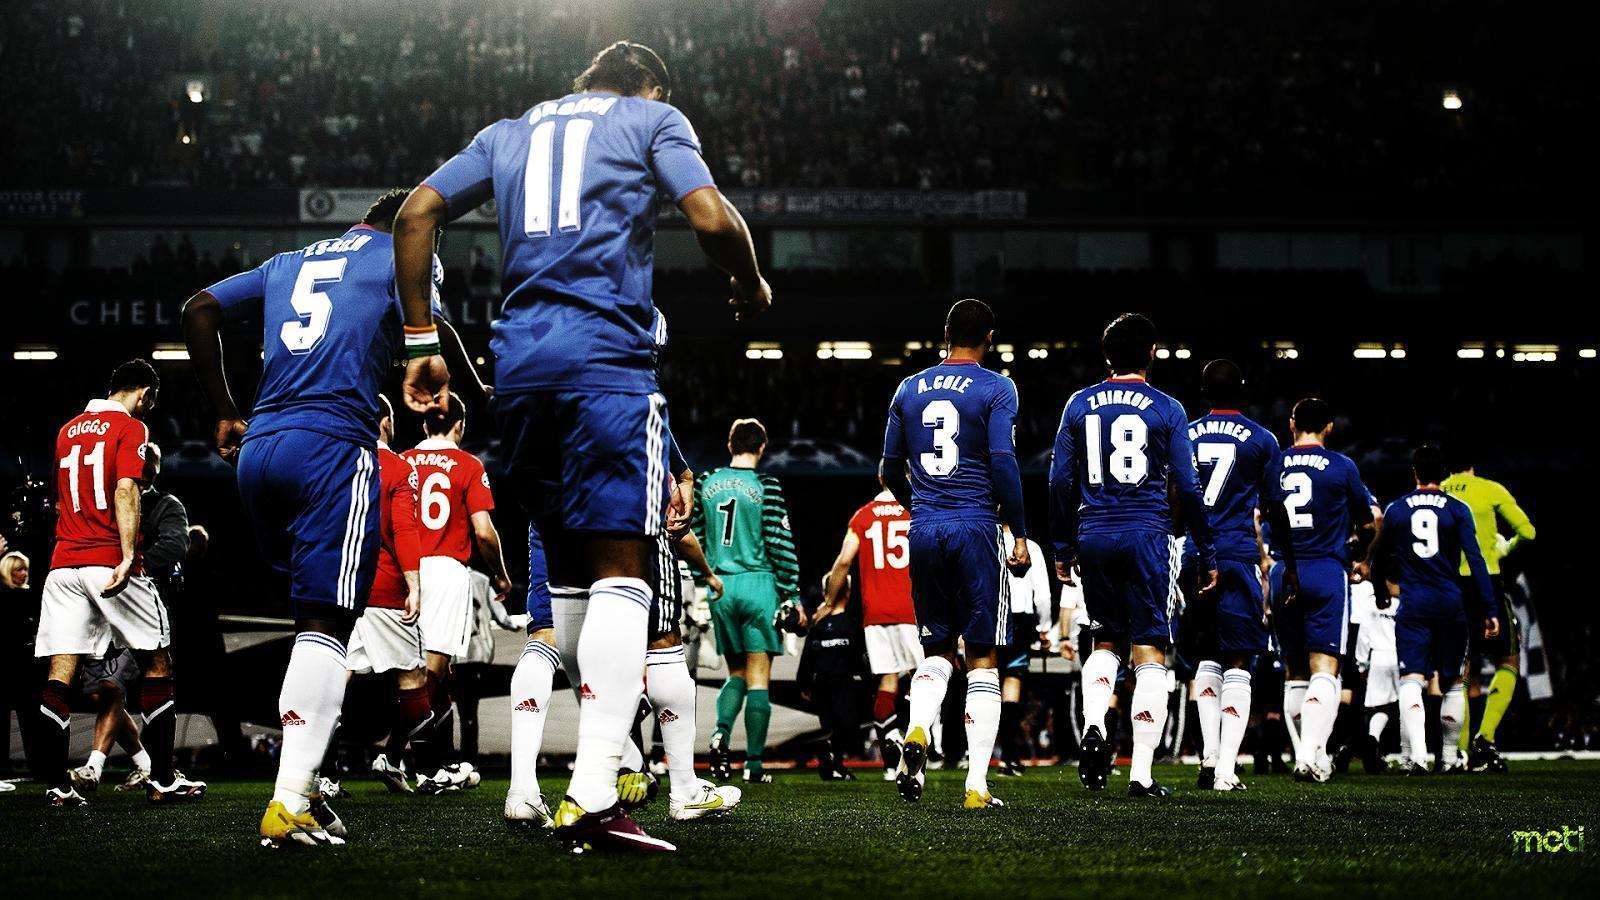 Chelsea Football Club Wallpaper | Football Wallpaper HD